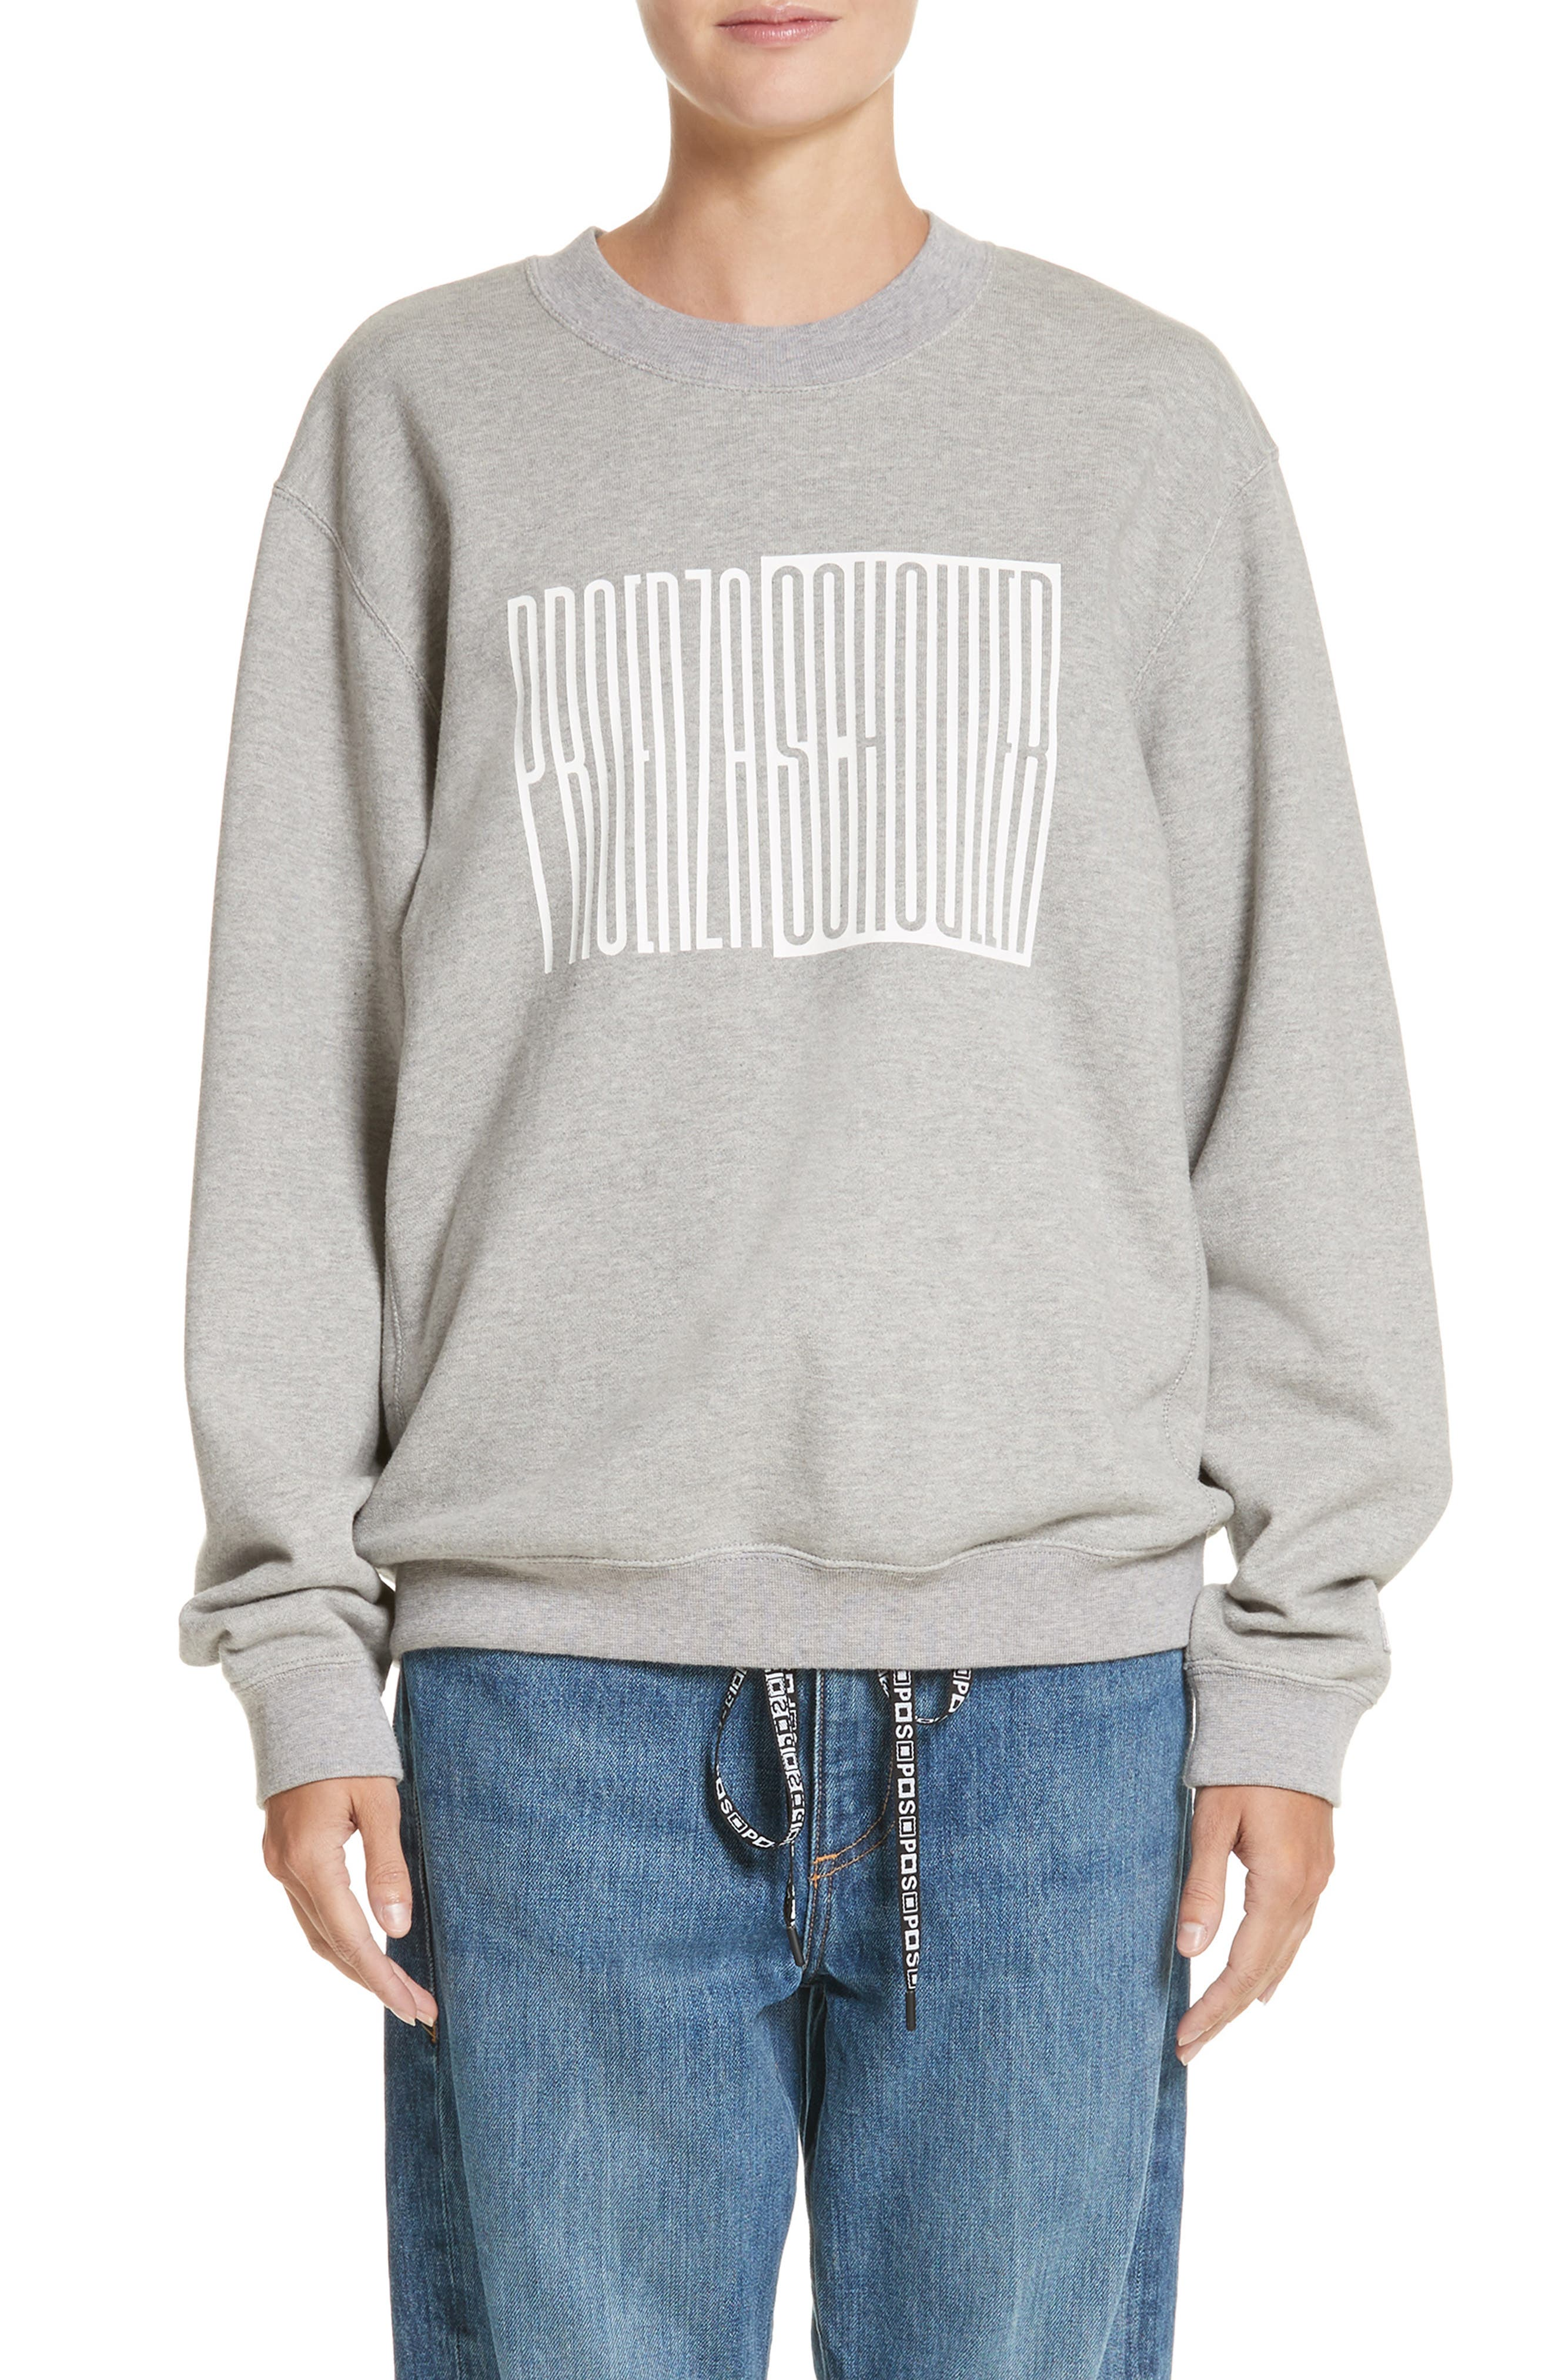 PSWL Graphic Jersey Oversize Sweatshirt,                             Main thumbnail 1, color,                             082